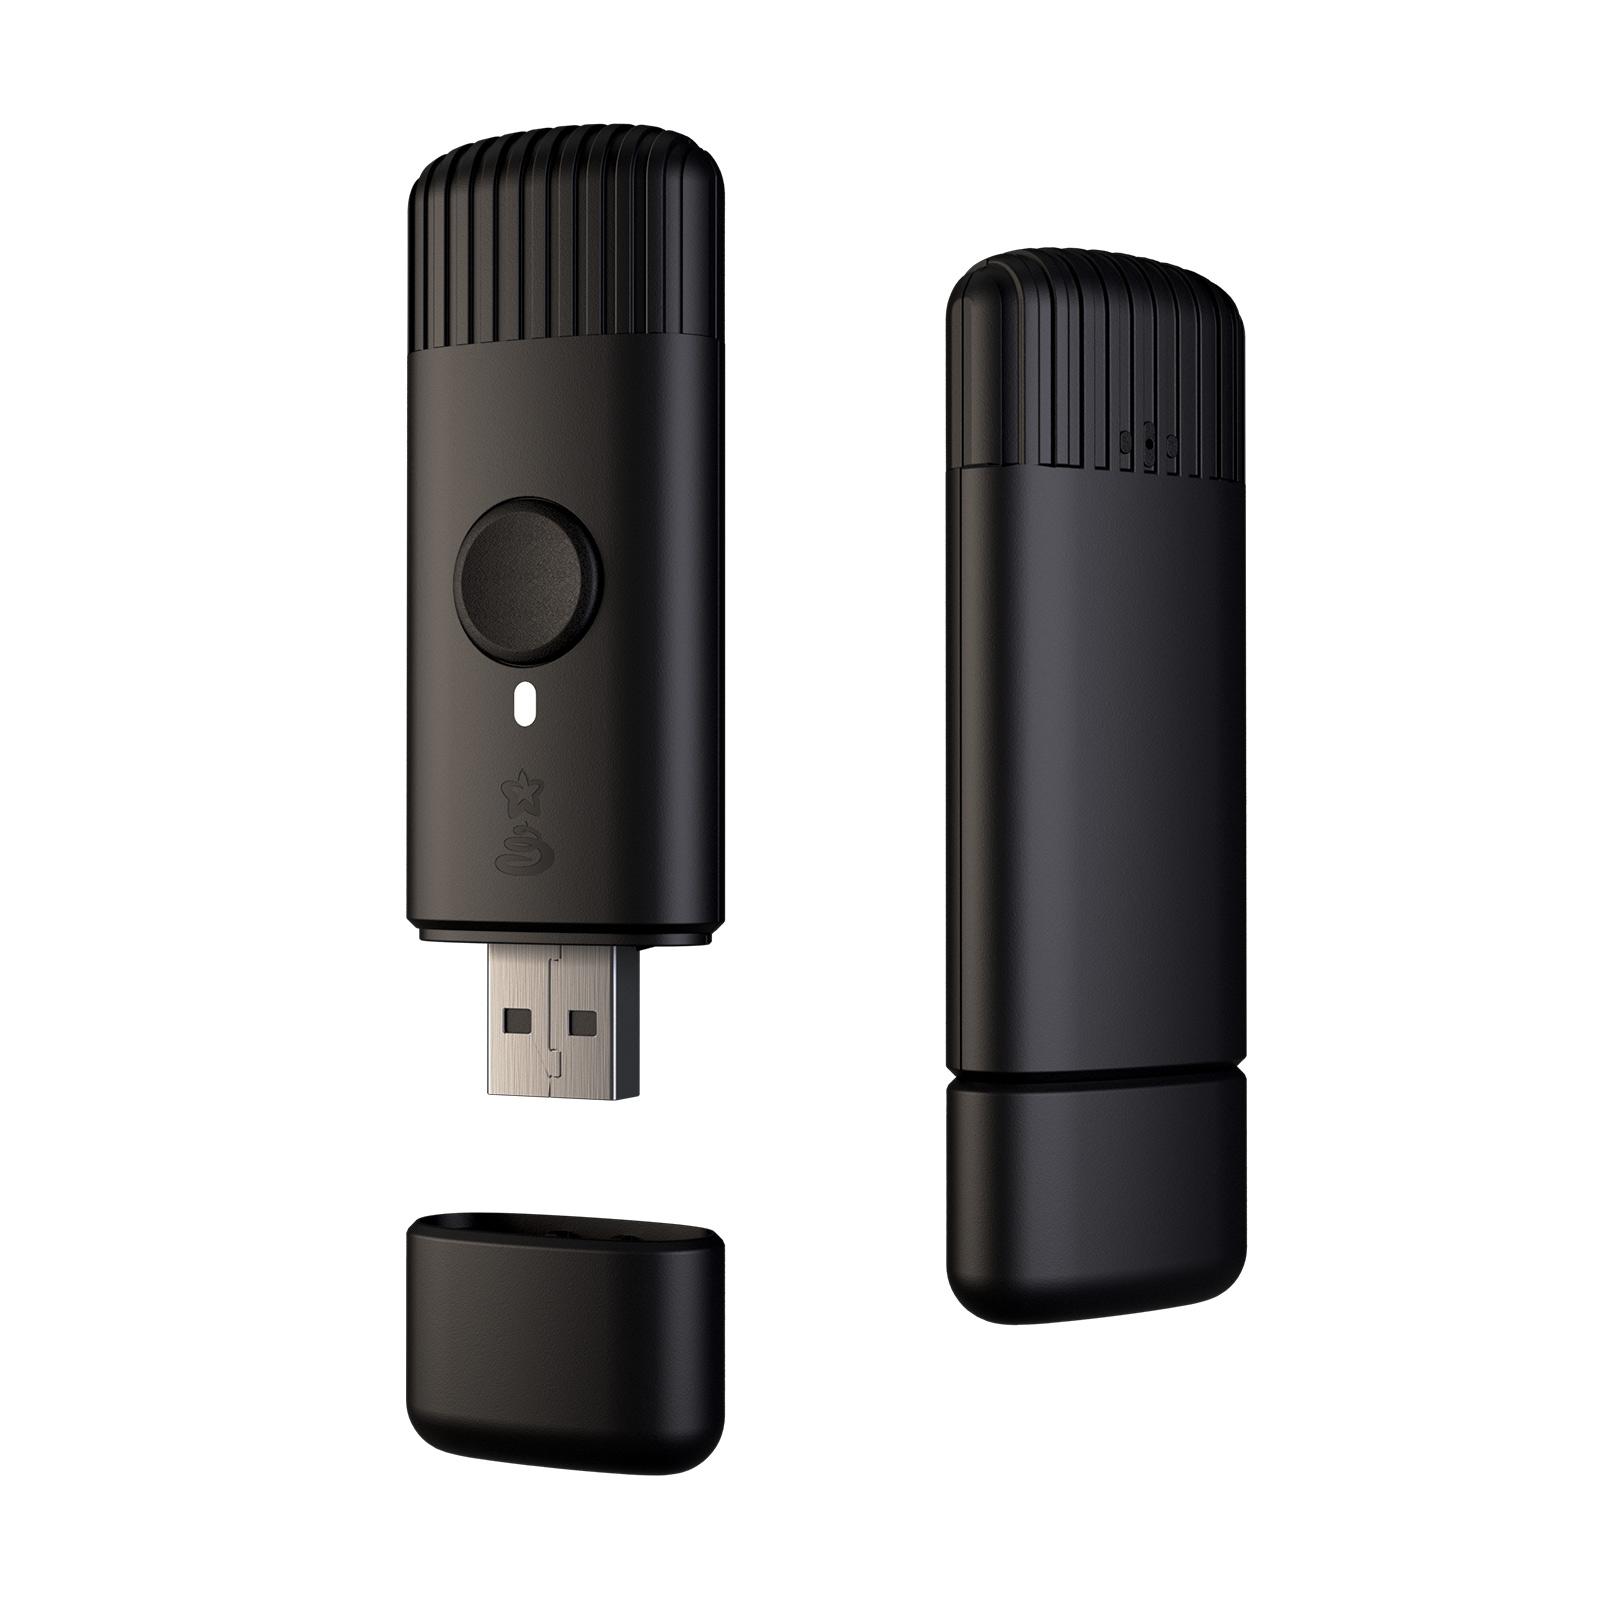 Musikksensor for Twinkly, USB, svart